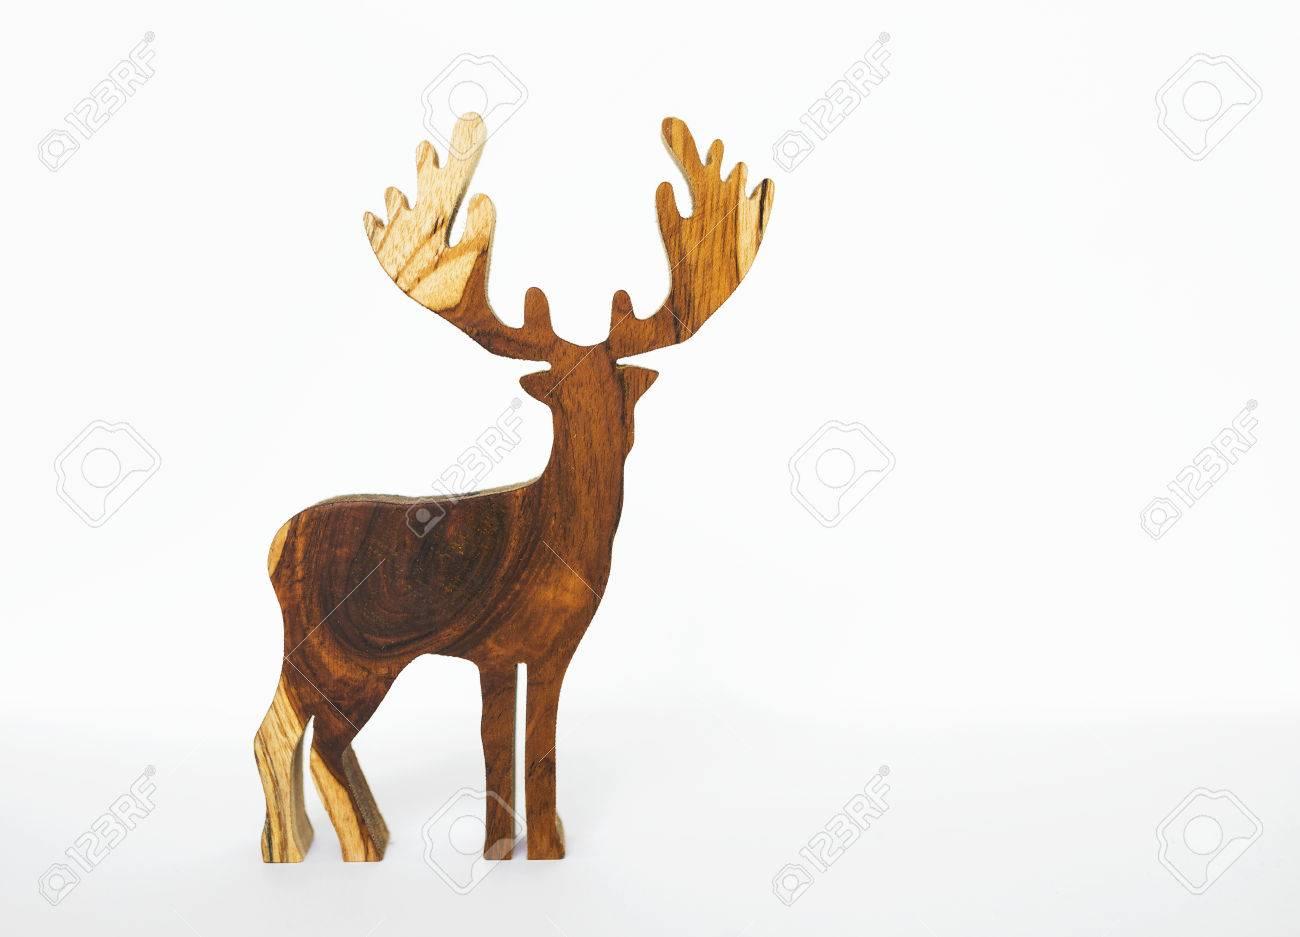 Wooden Reindeer Patterns Free Best Inspiration Design